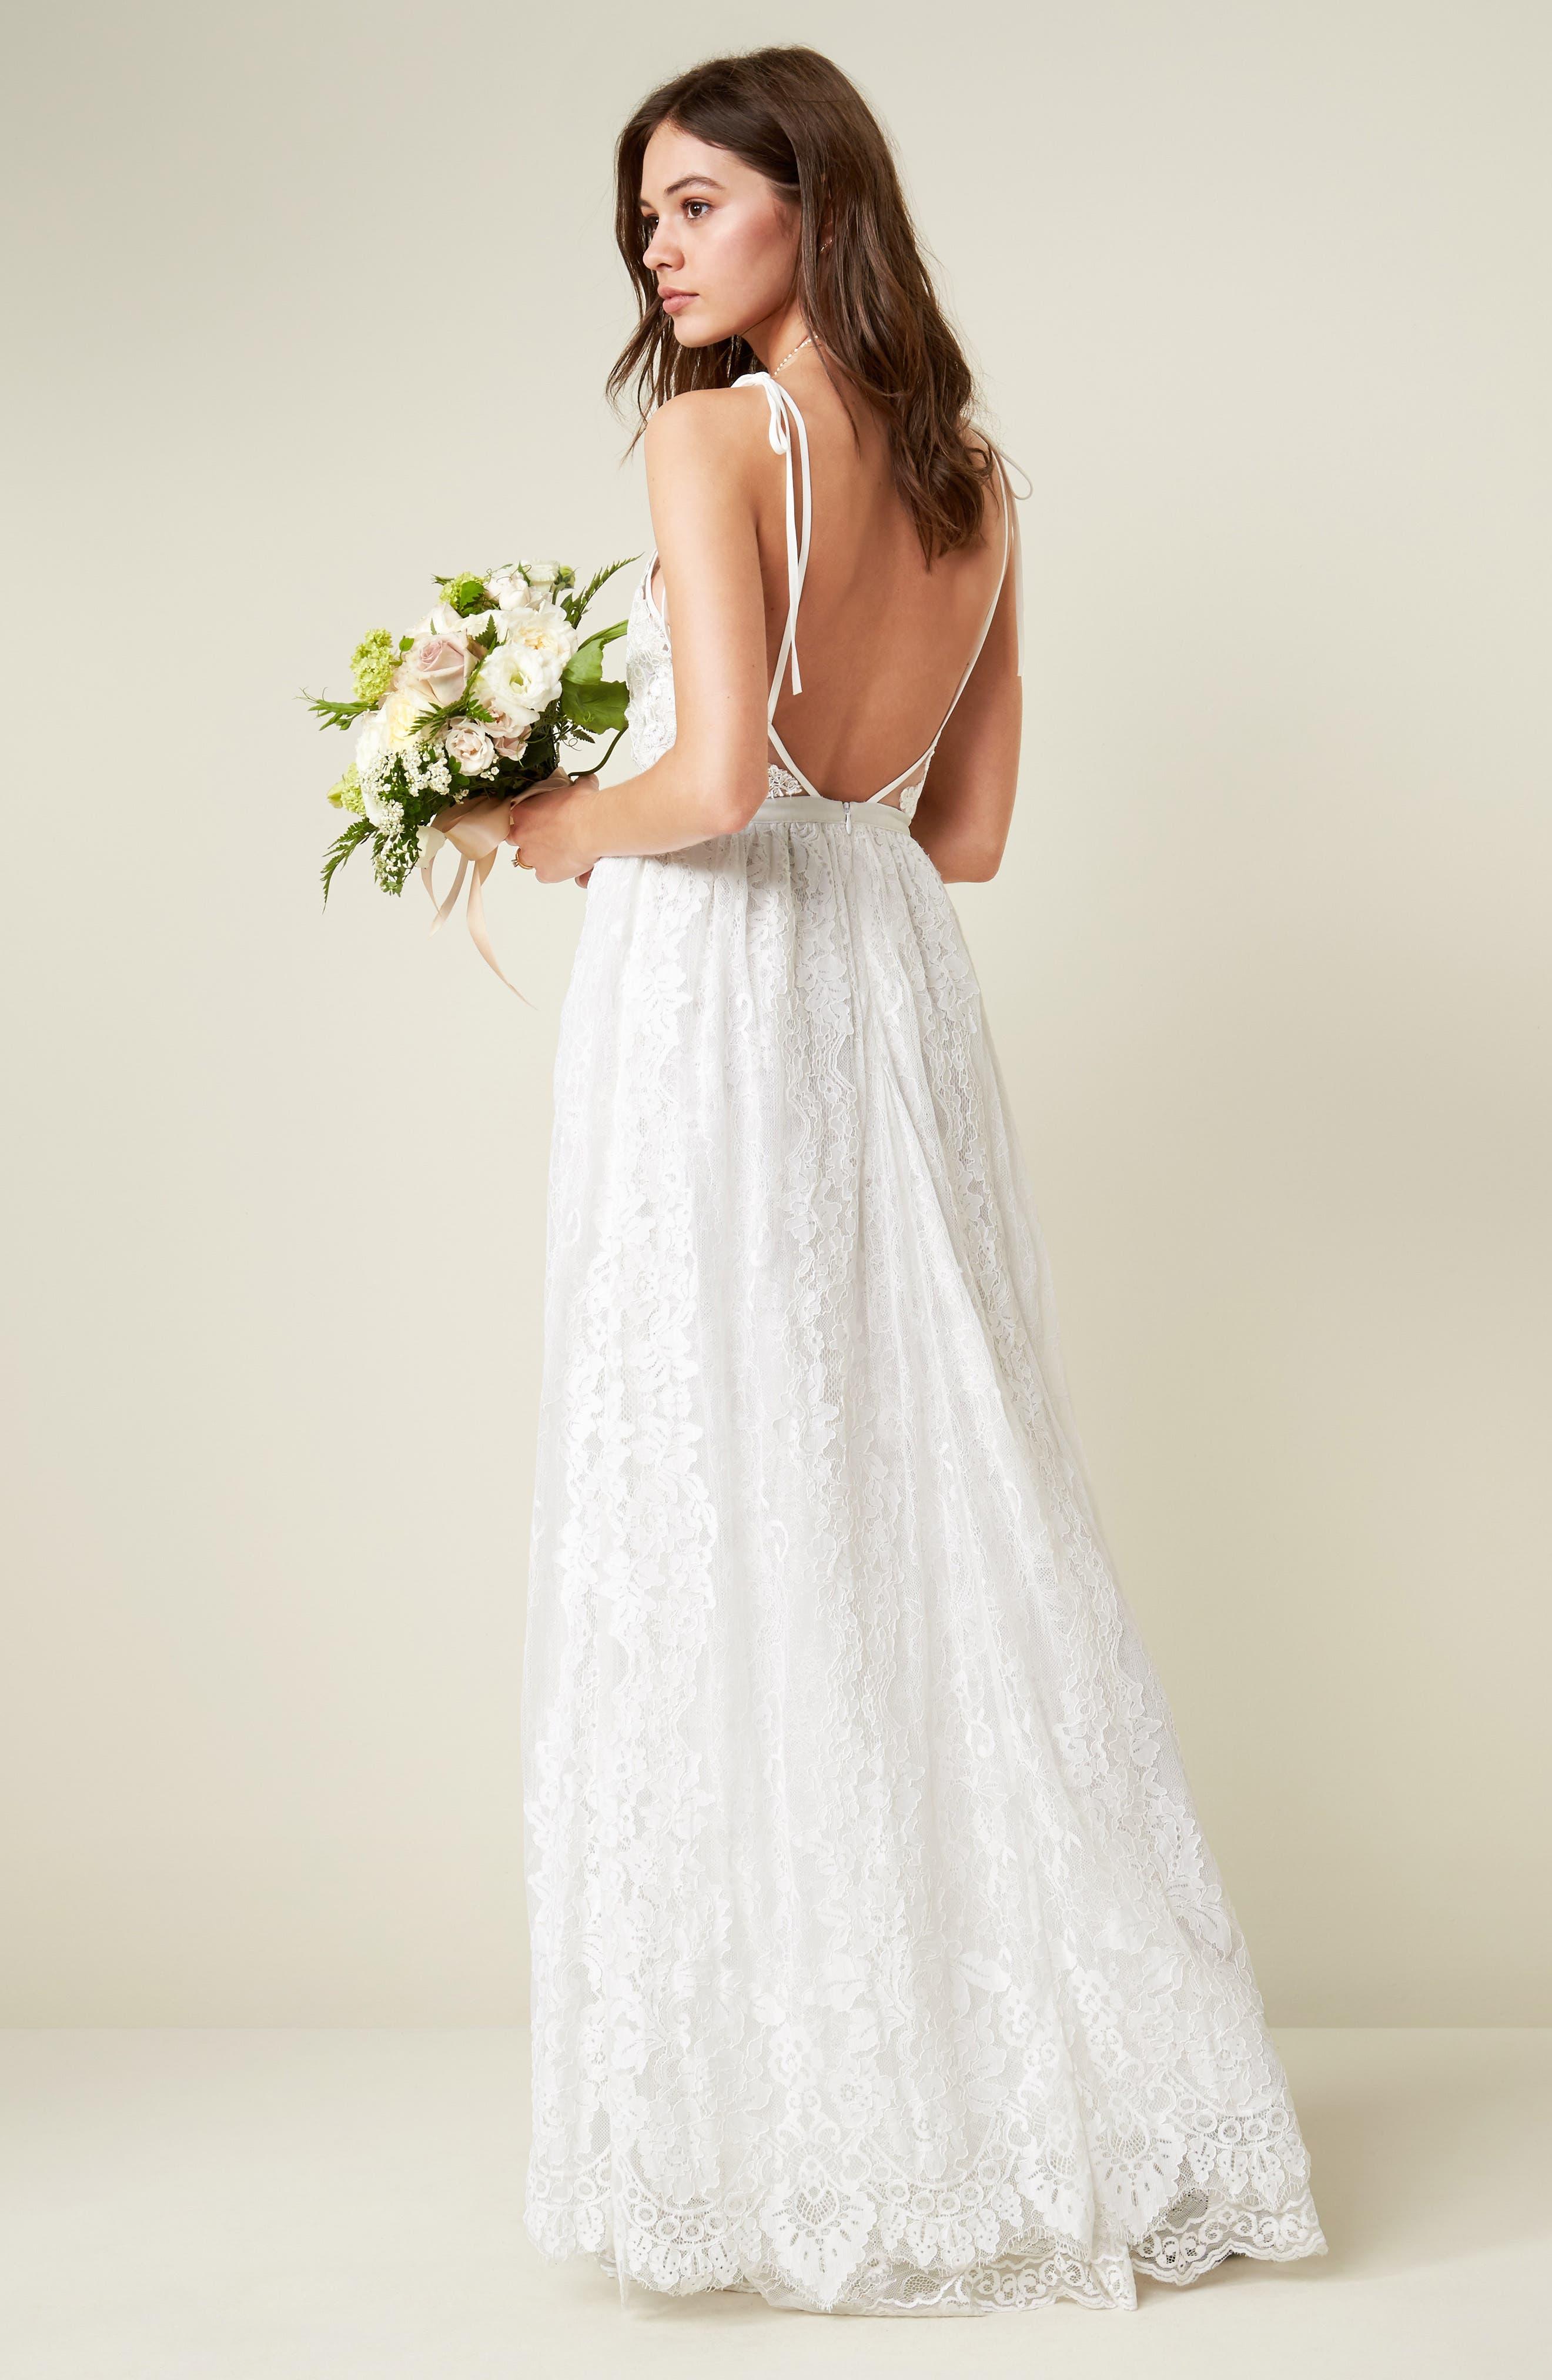 women's wedding dresses & bridal gowns | nordstrom